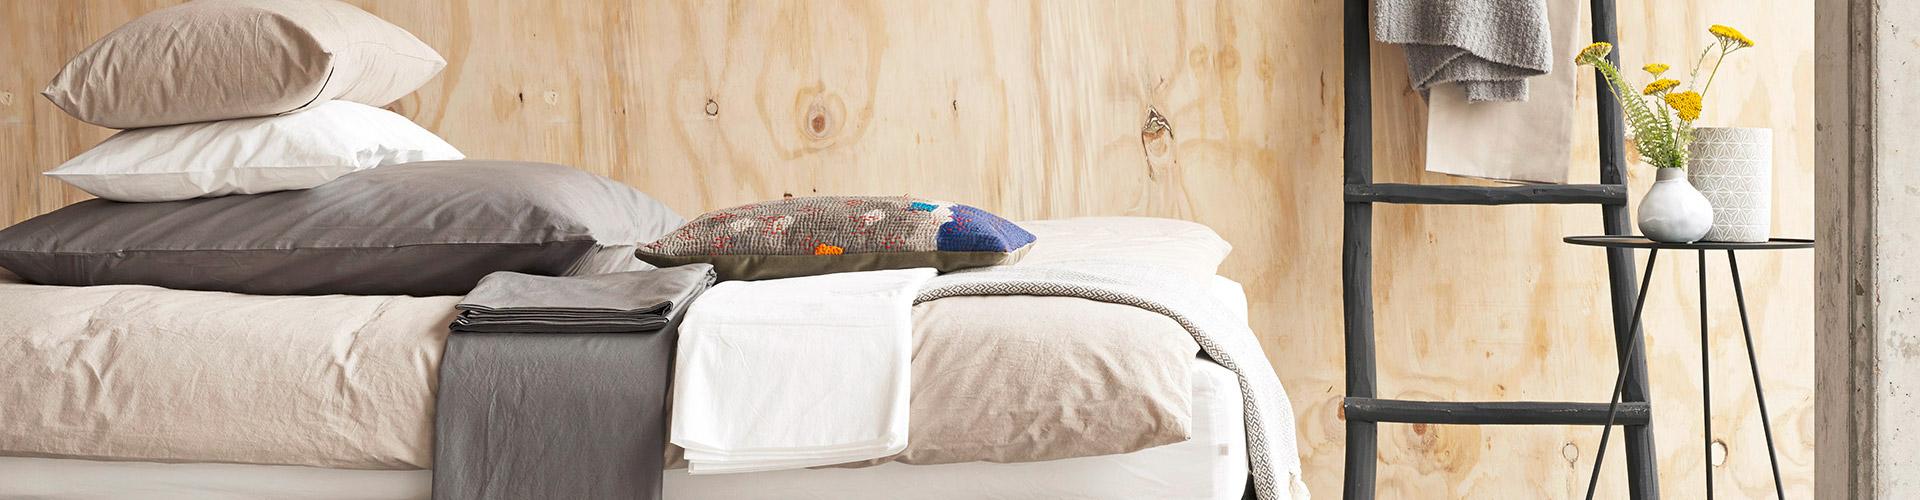 Möller Design Betten bei Betten Auer im werkhaus